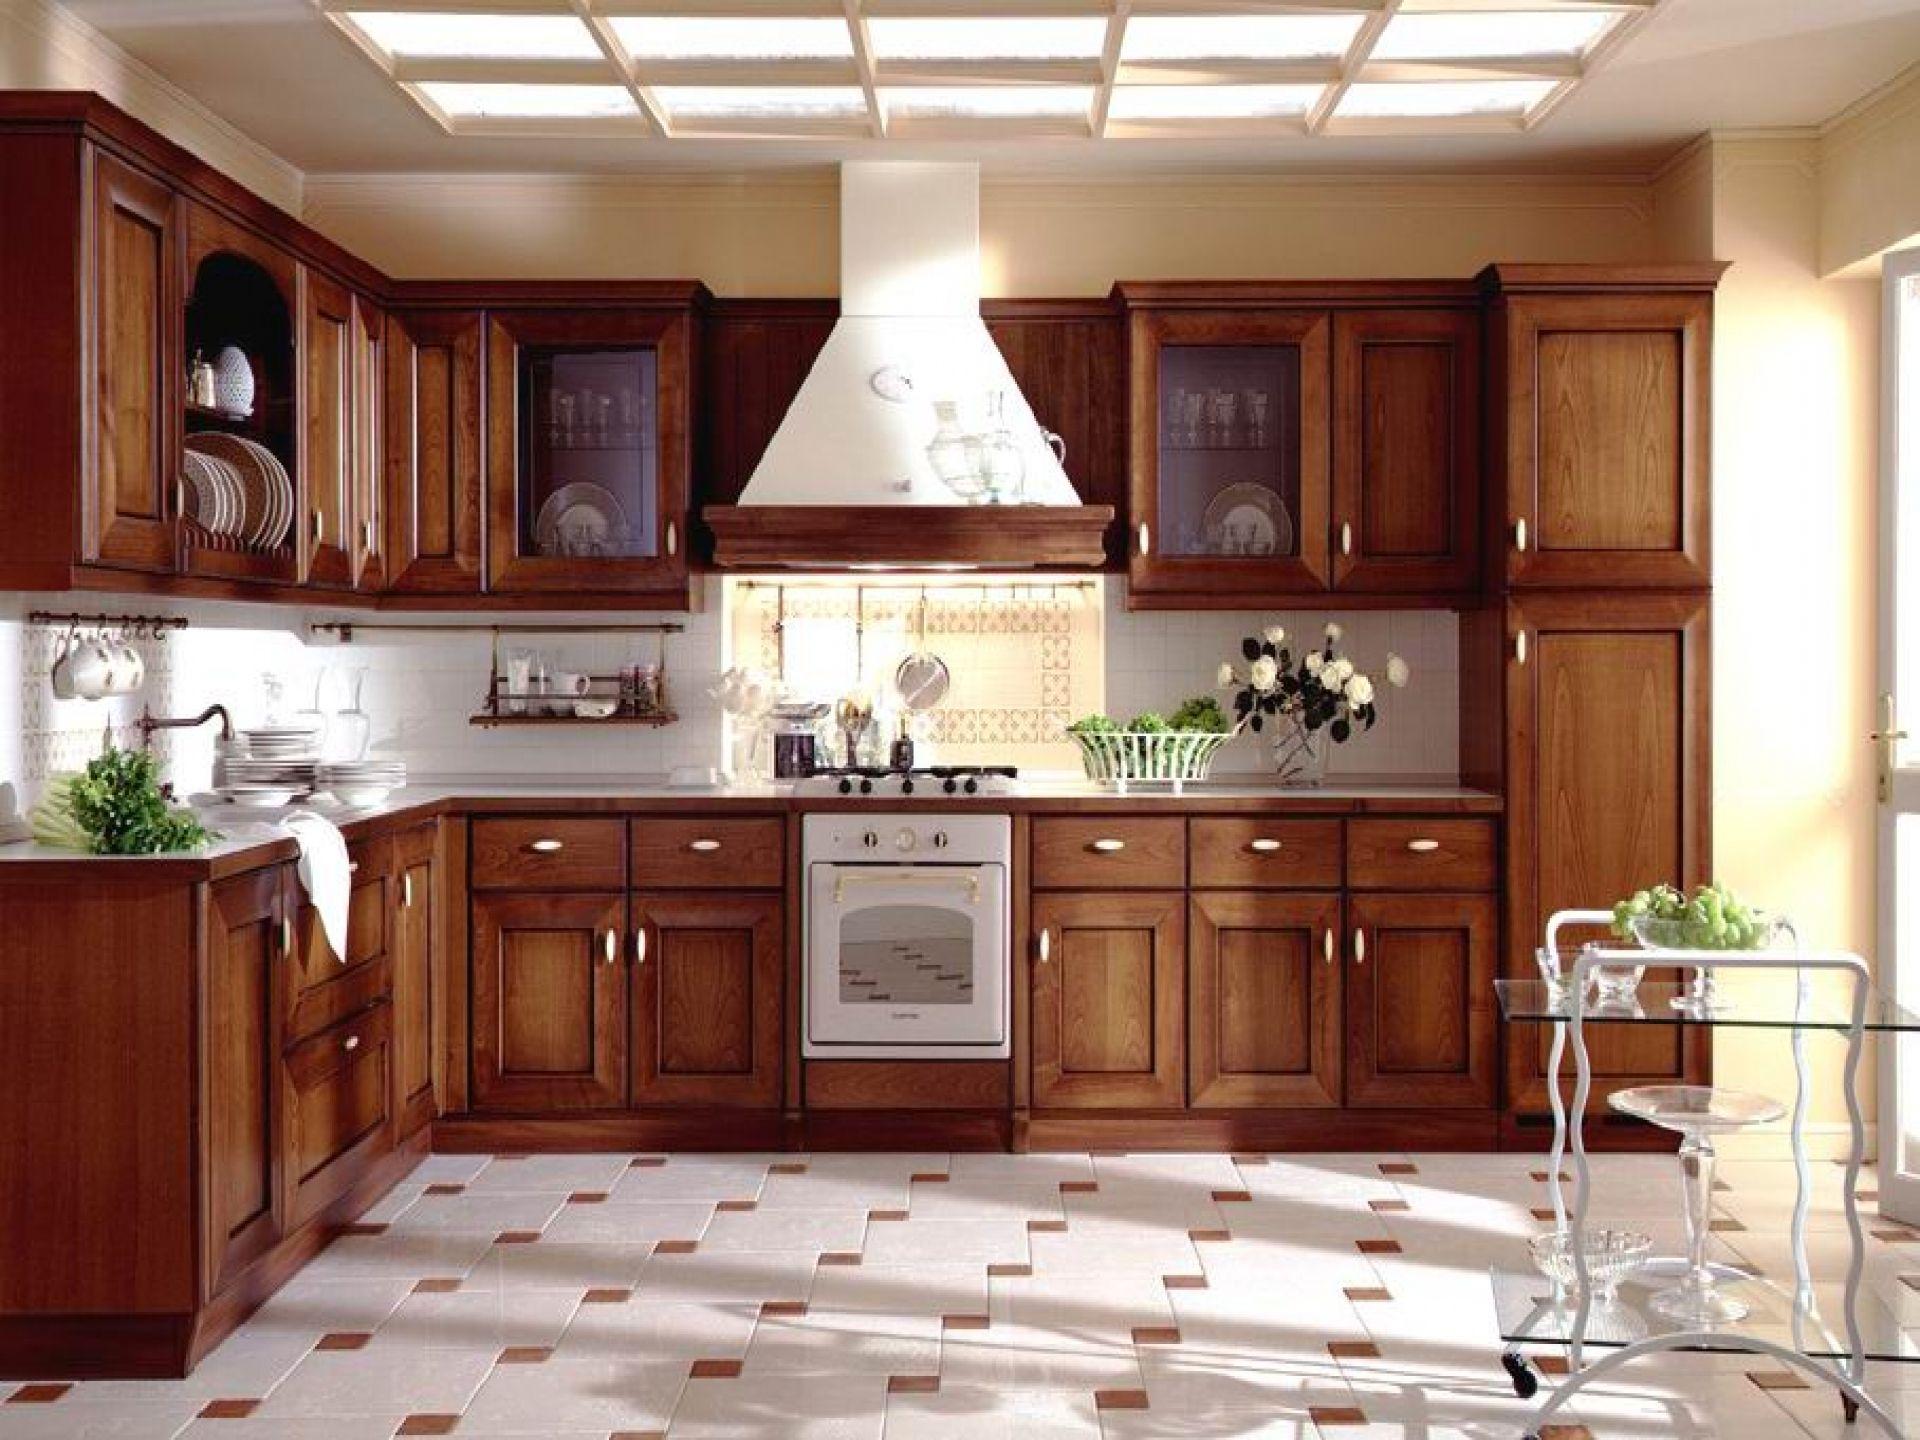 Küche Kabinett Design Tool - Schlafzimmer | Hausmodelle | Pinterest